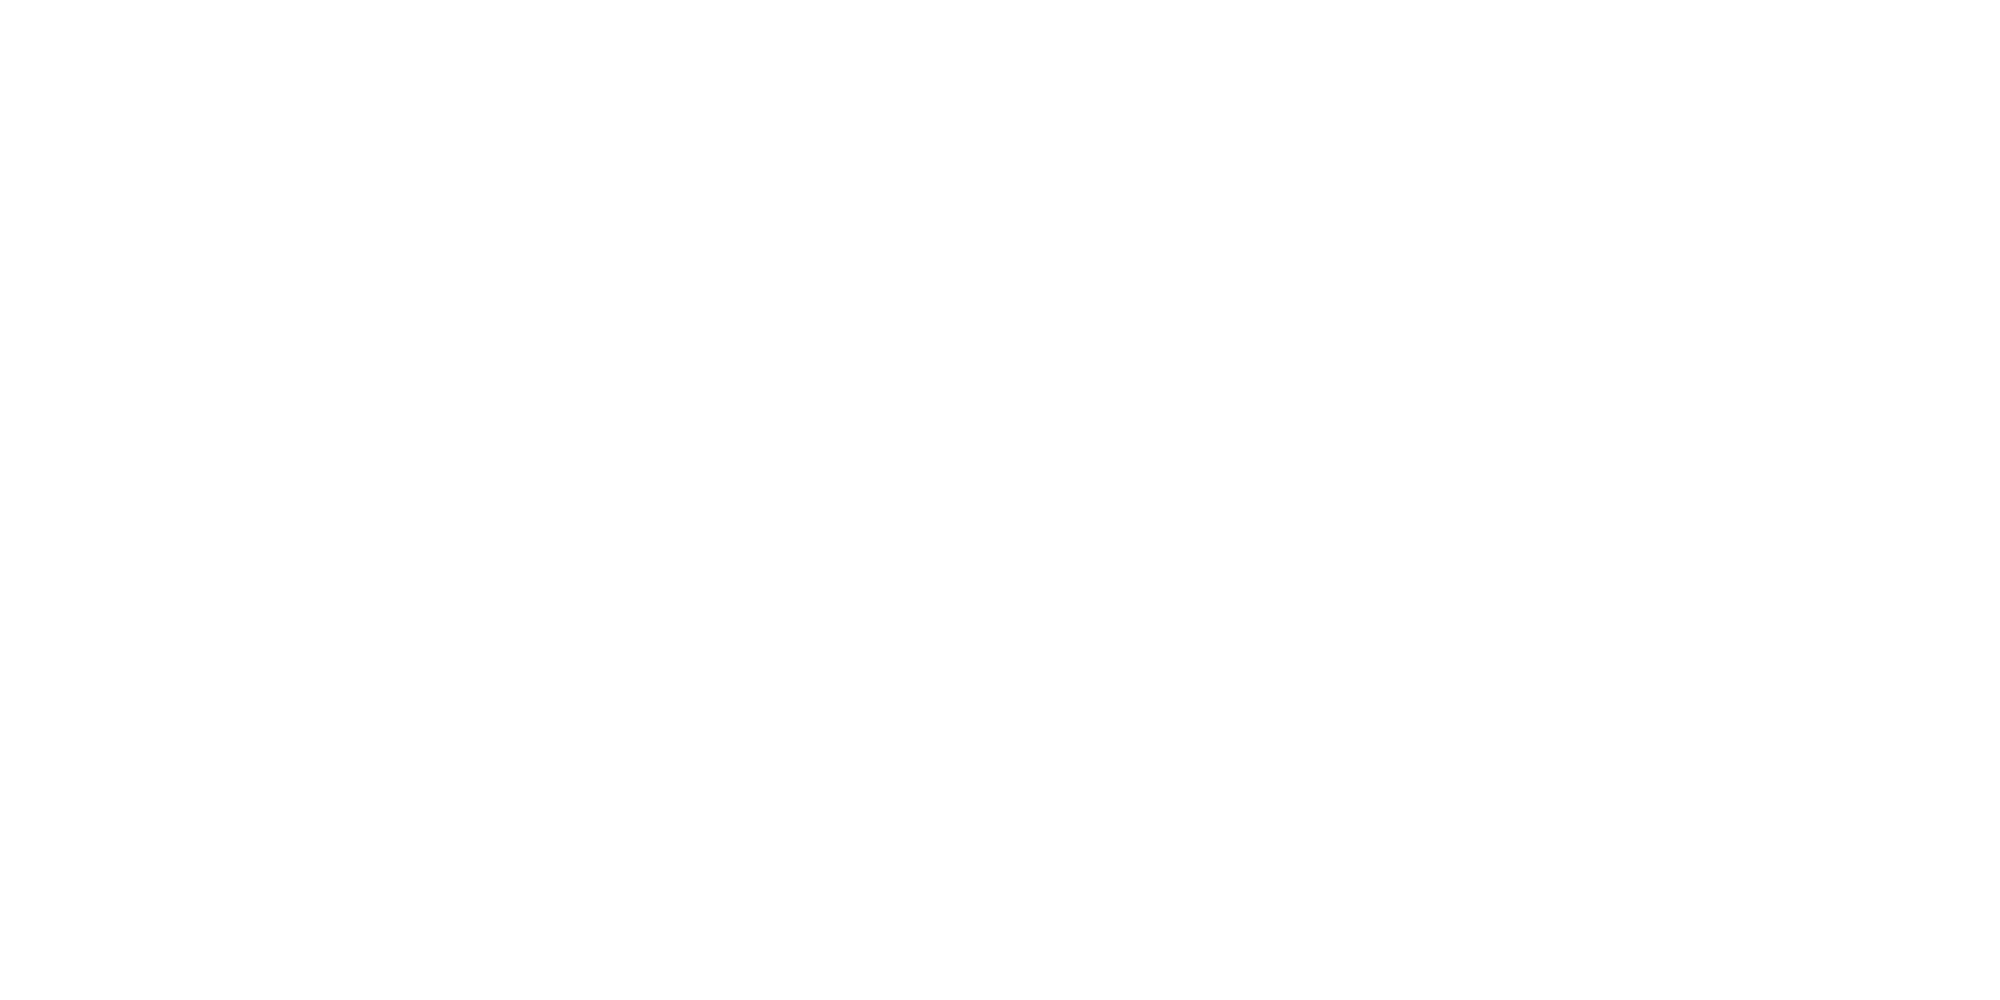 شرکت آناک صنعت